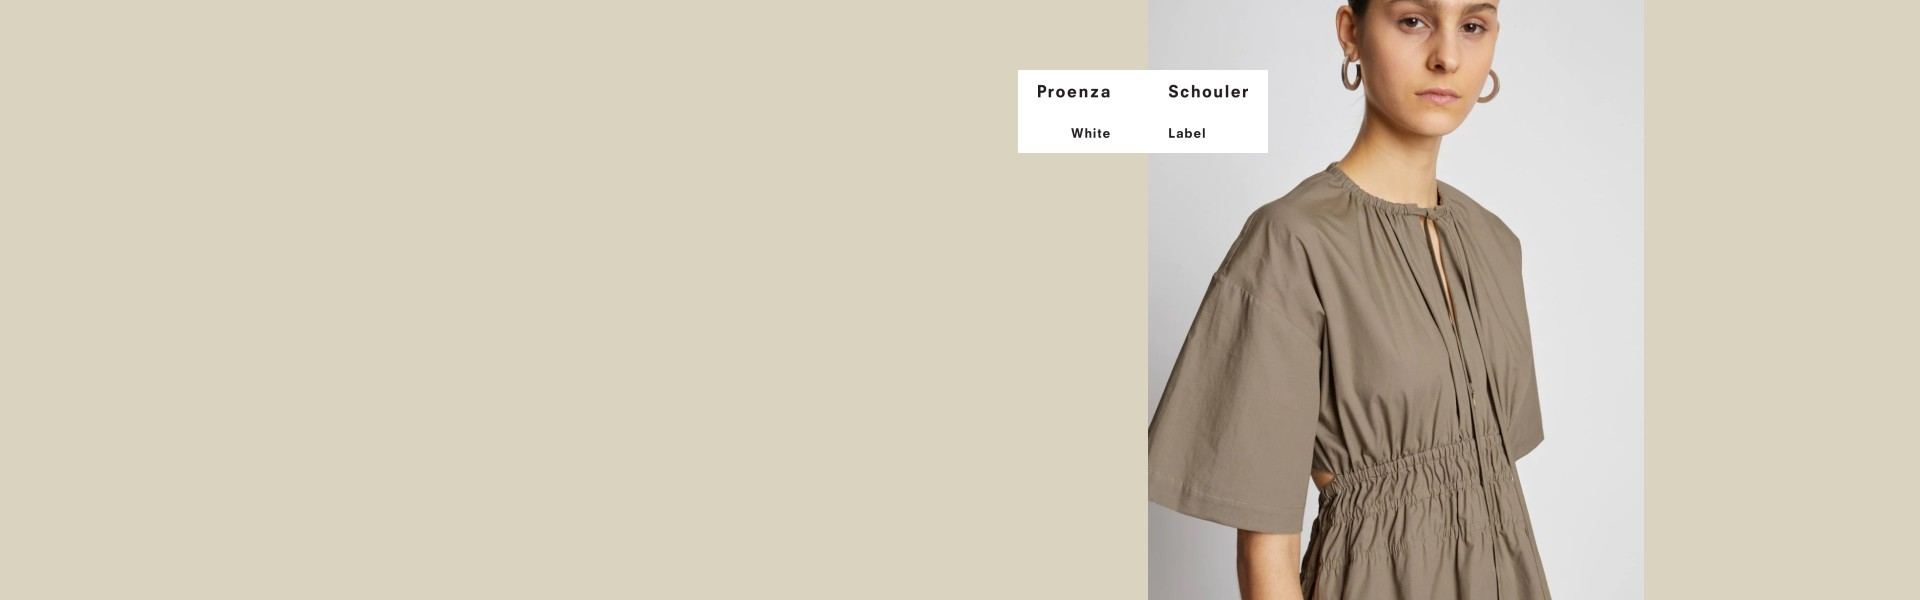 Proenza Schouler White Label